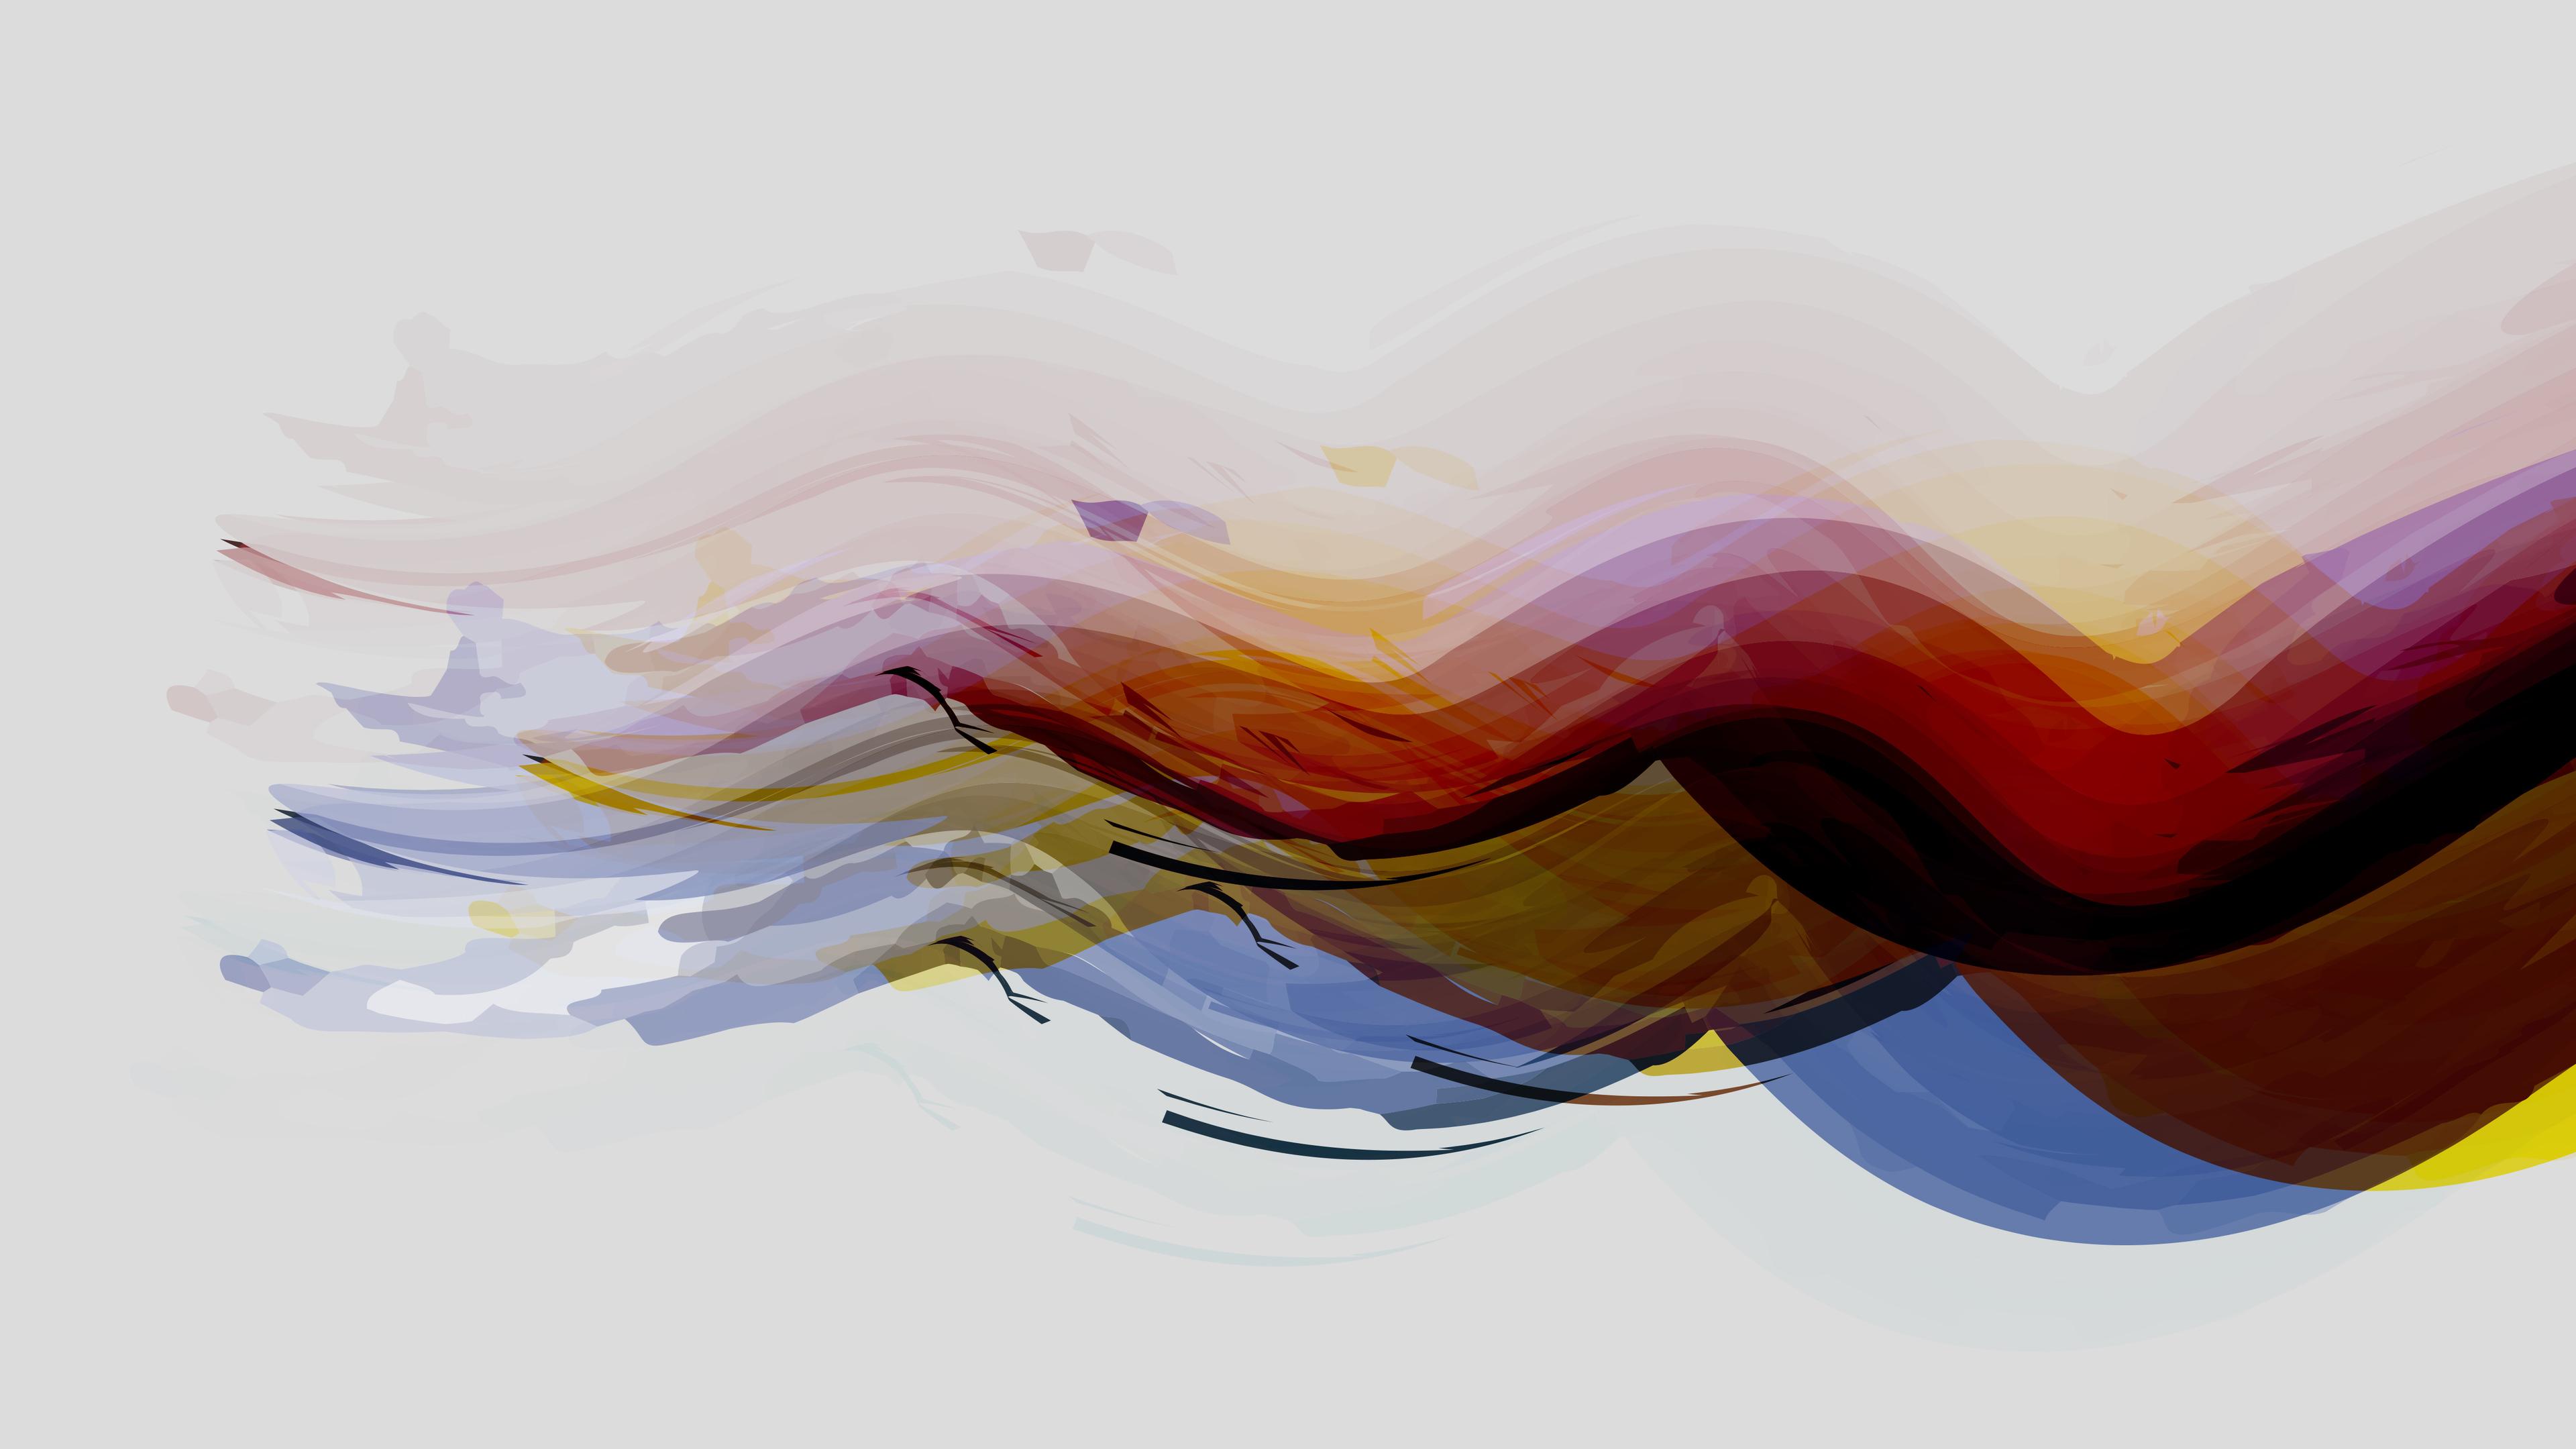 waves of color 5k 1543945834 - Waves Of Color 5k - waves wallpapers, hd-wallpapers, digital art wallpapers, deviantart wallpapers, color wallpapers, artwork wallpapers, artist wallpapers, abstract wallpapers, 5k wallpapers, 4k-wallpapers